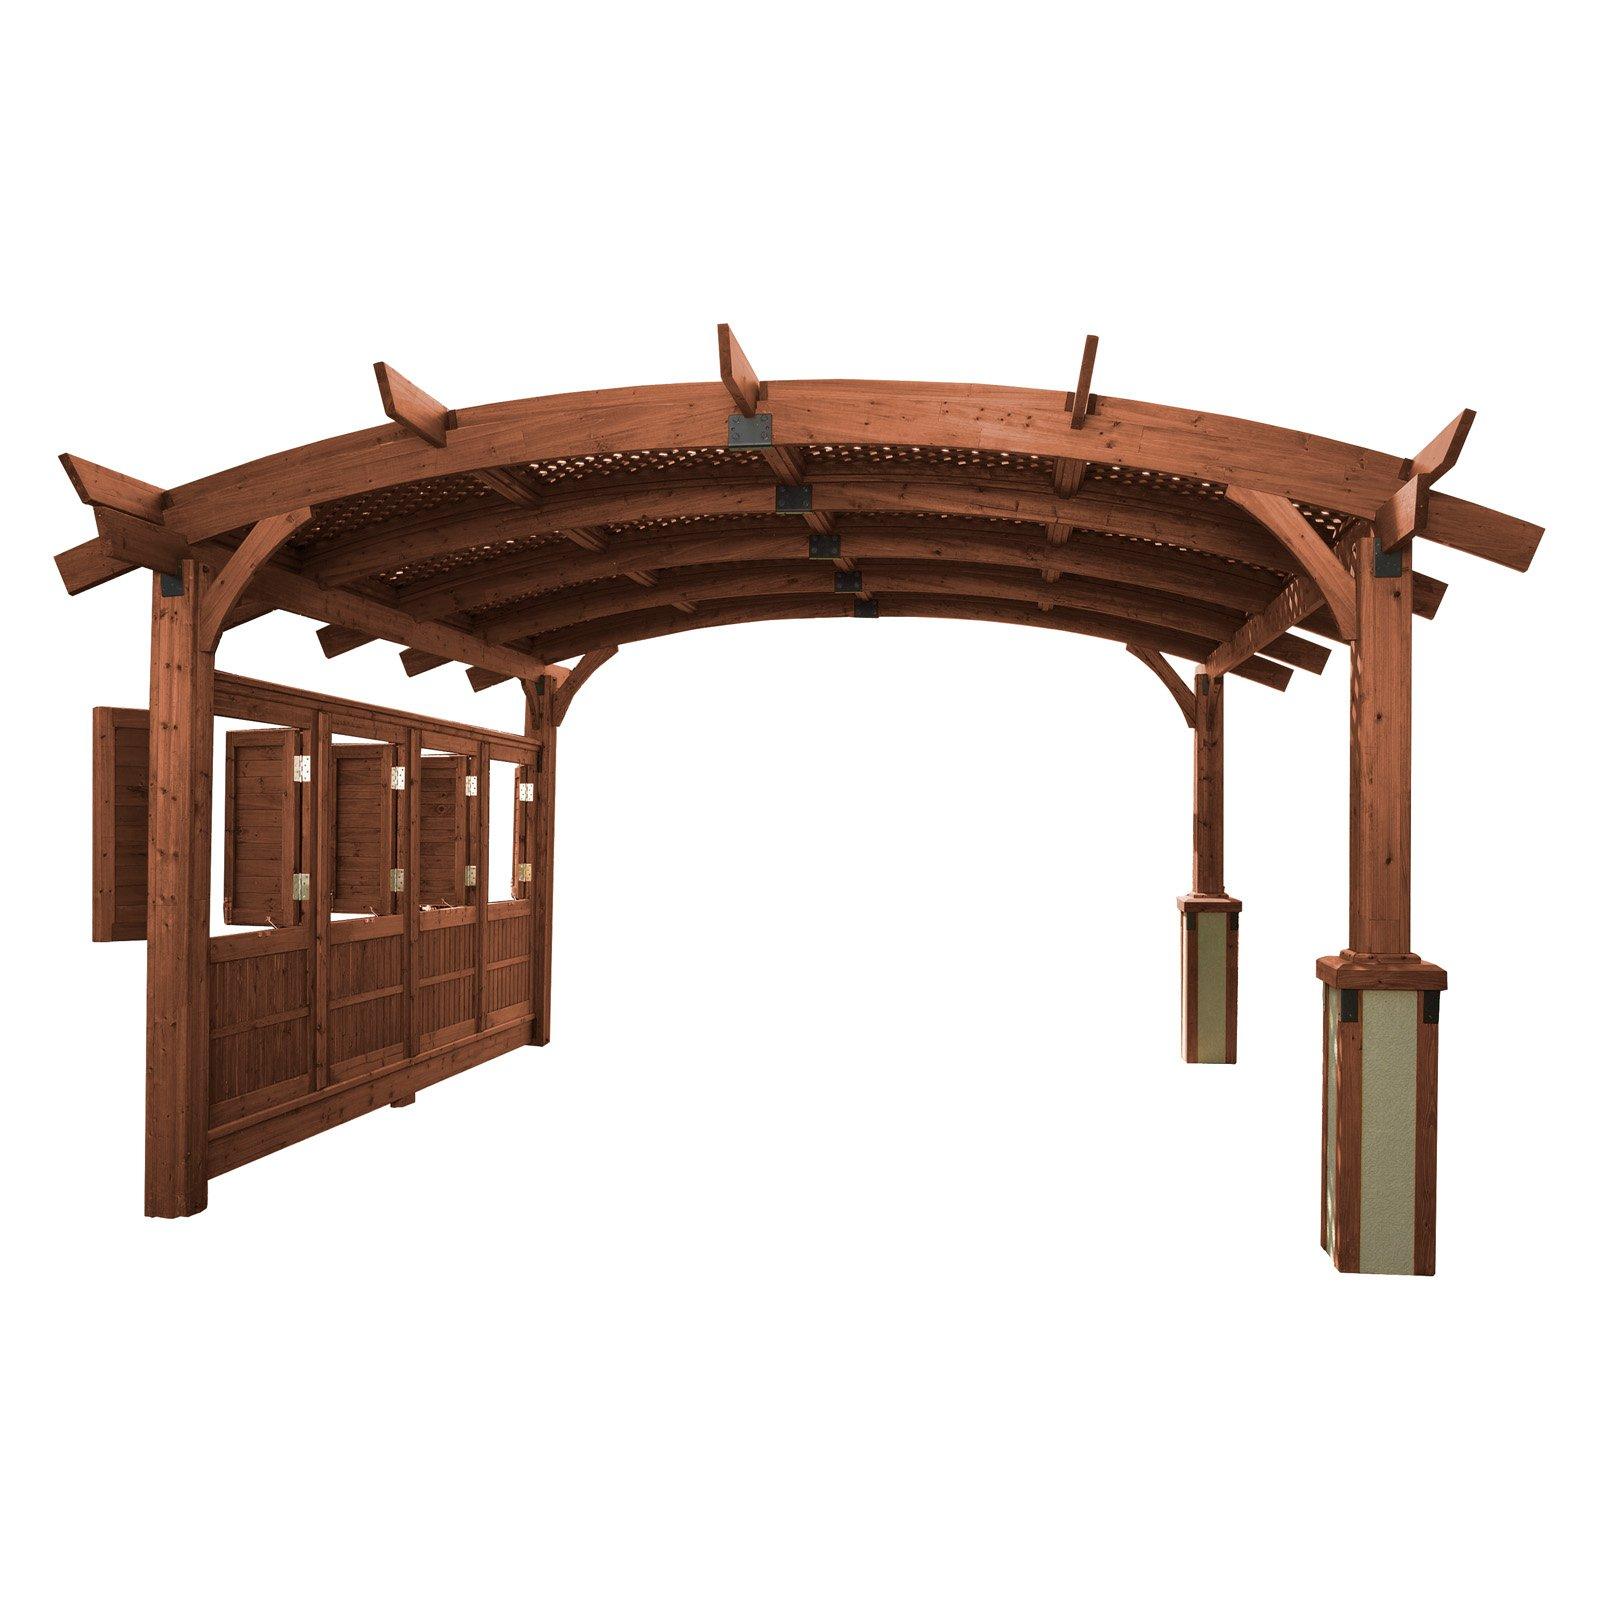 Sonoma Arched Wood Pergola - 16 x 16 ft.